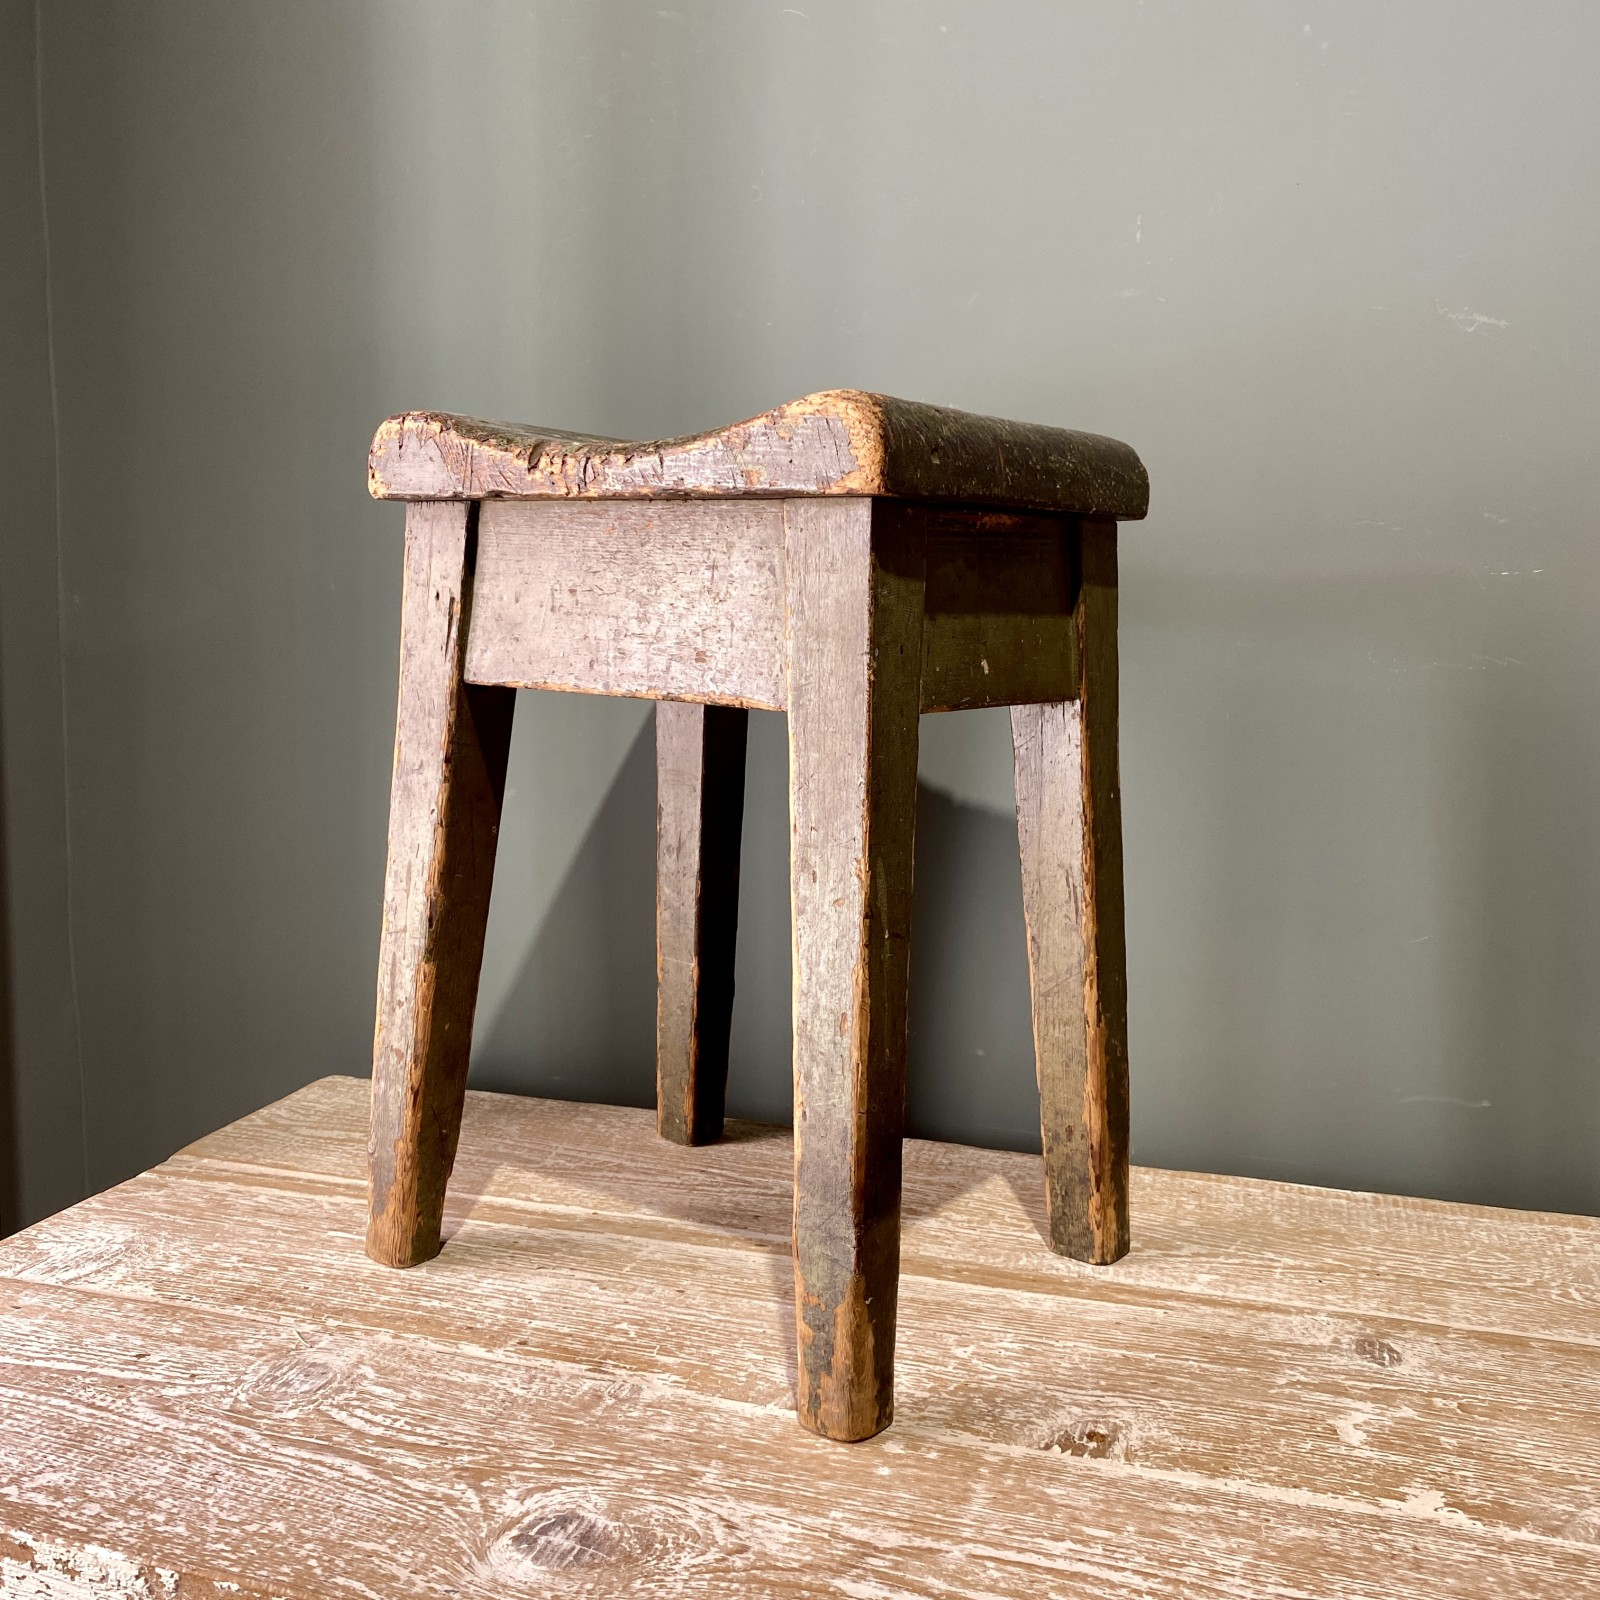 19th century wood stool